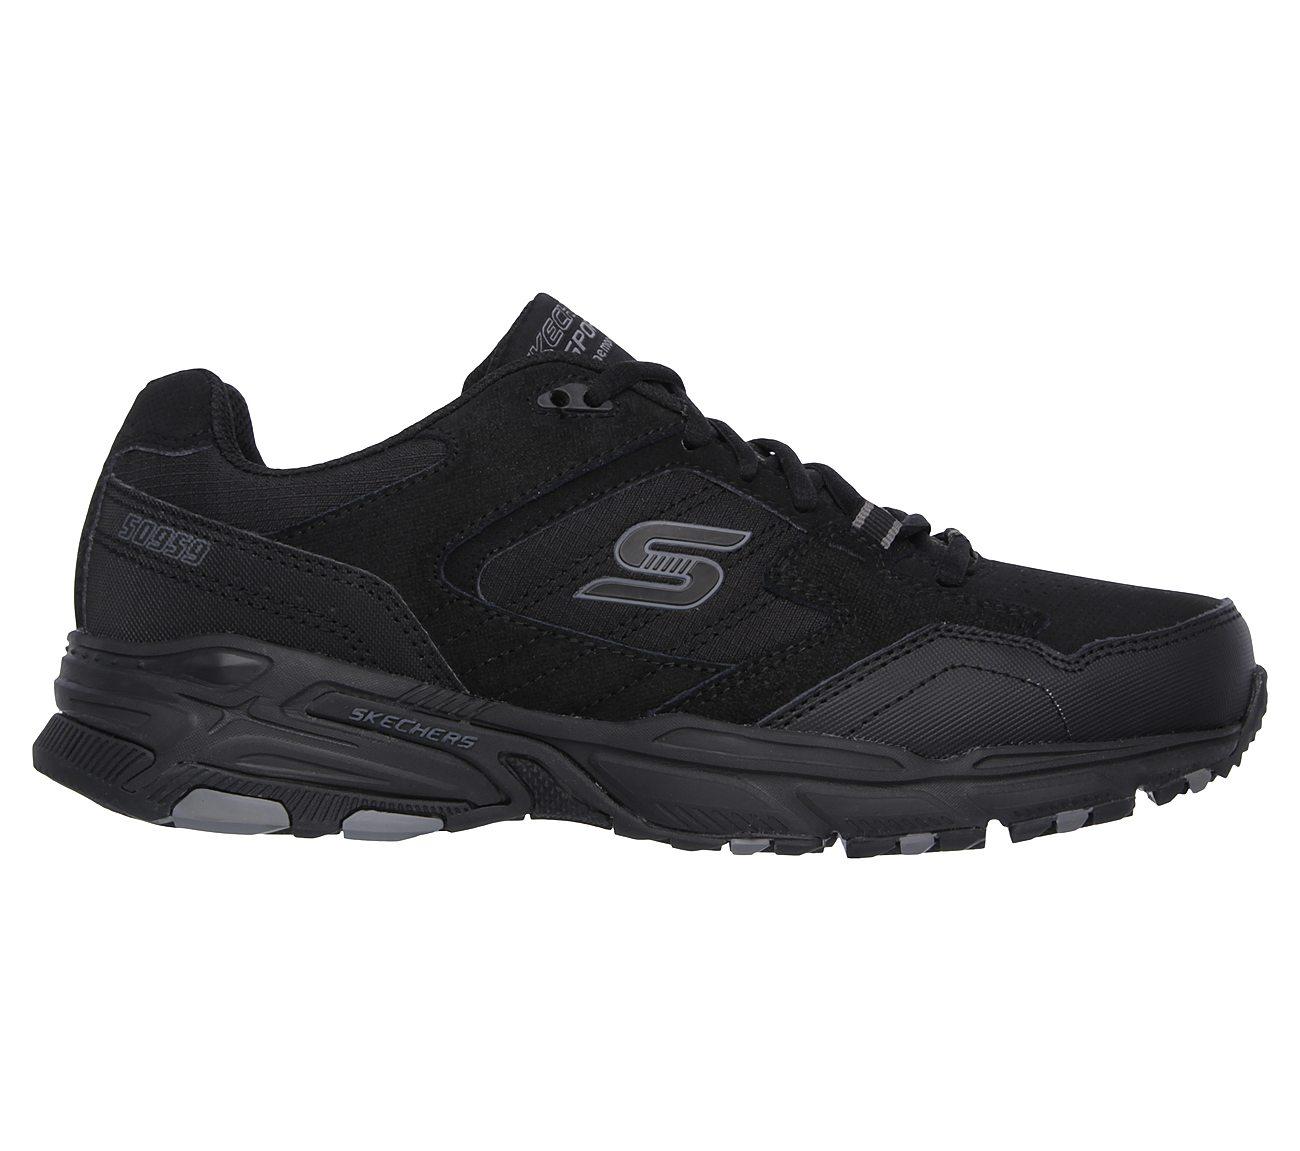 Buy SKECHERS Stamina Plus Sport Shoes